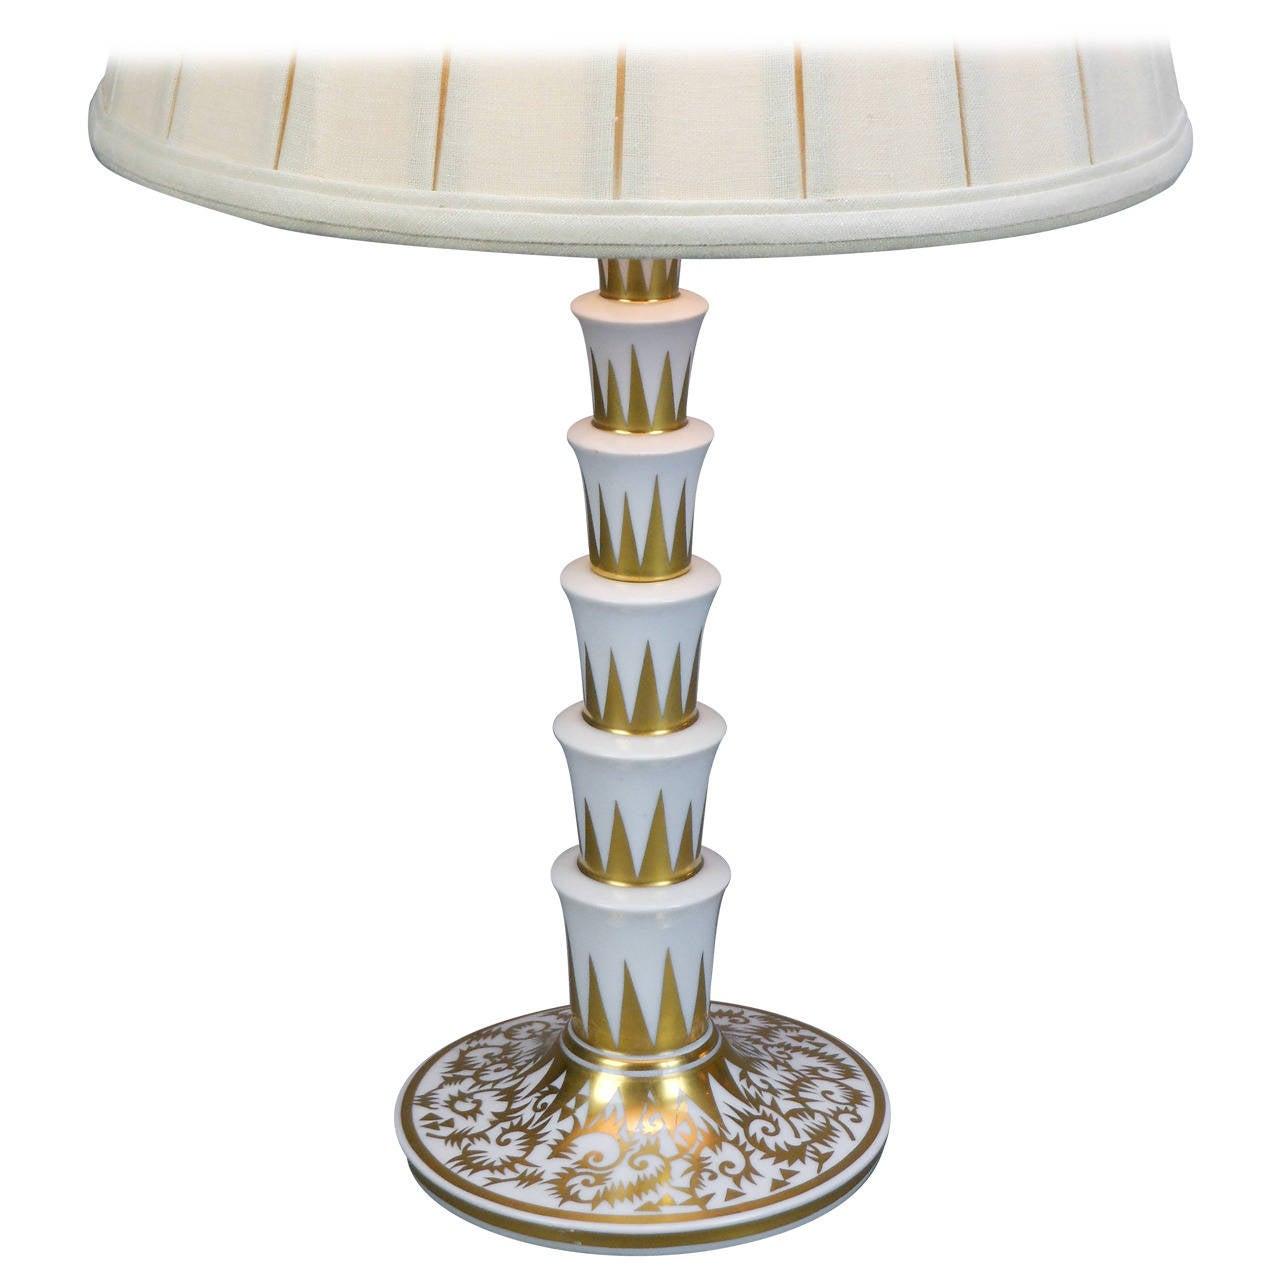 German Porcelain Lamp by Rosenthal